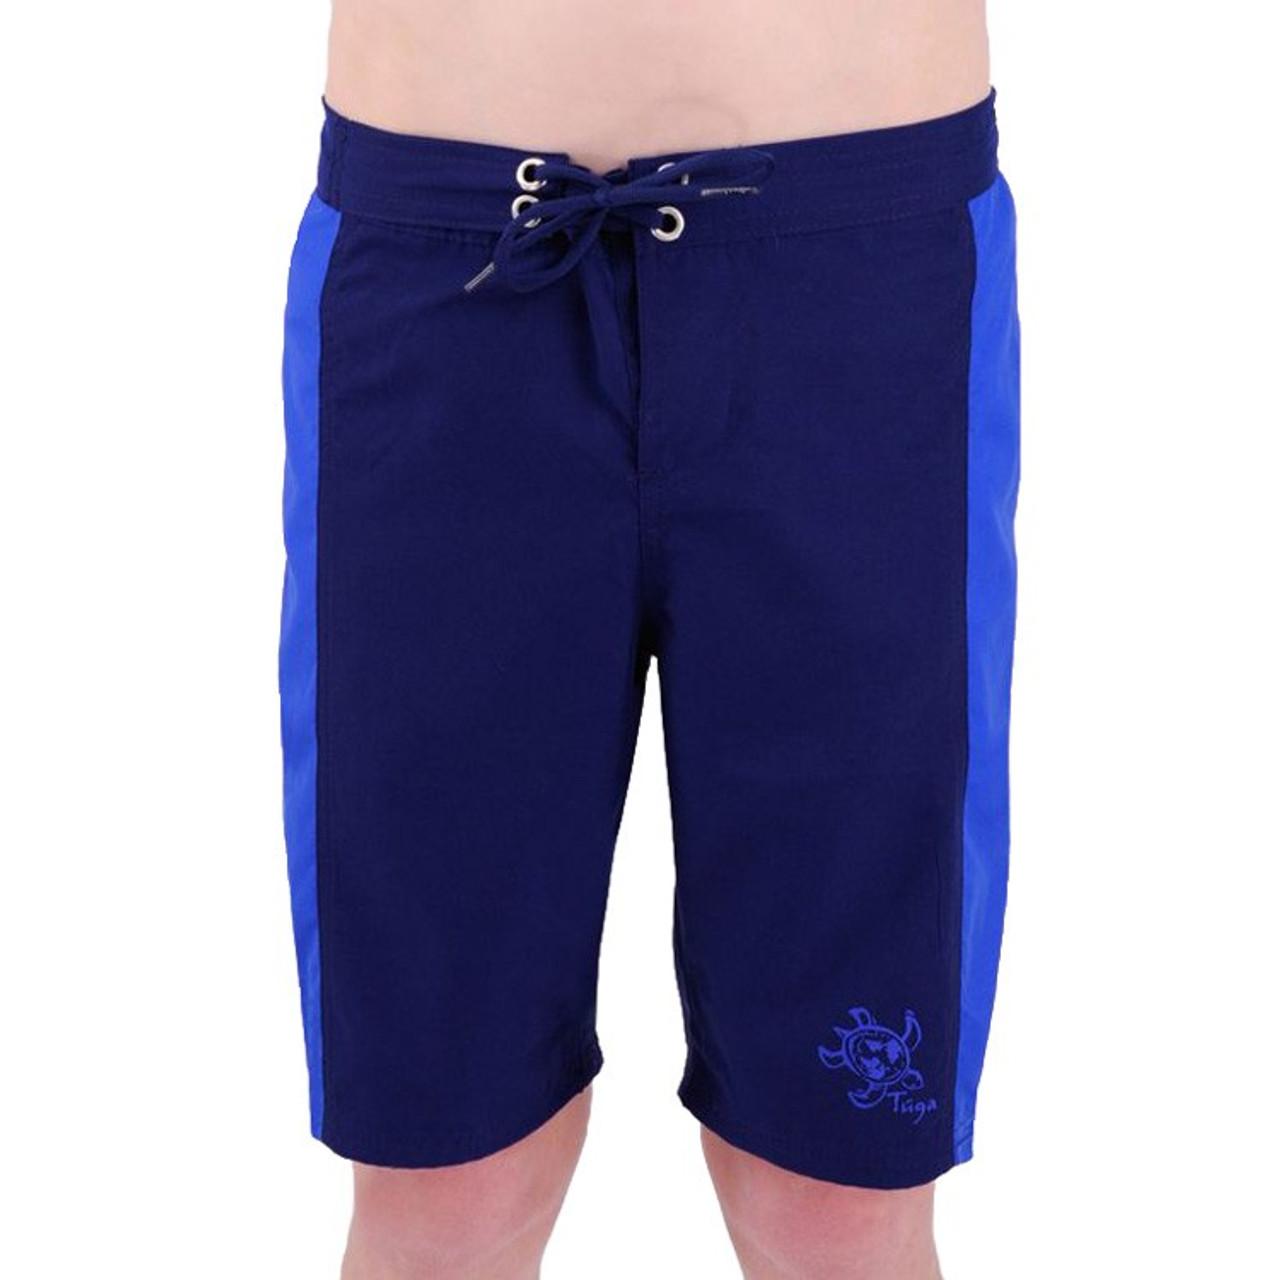 aad747eff2733 Boys Tuga UV Board Shorts Blue | Boys UV Clothing